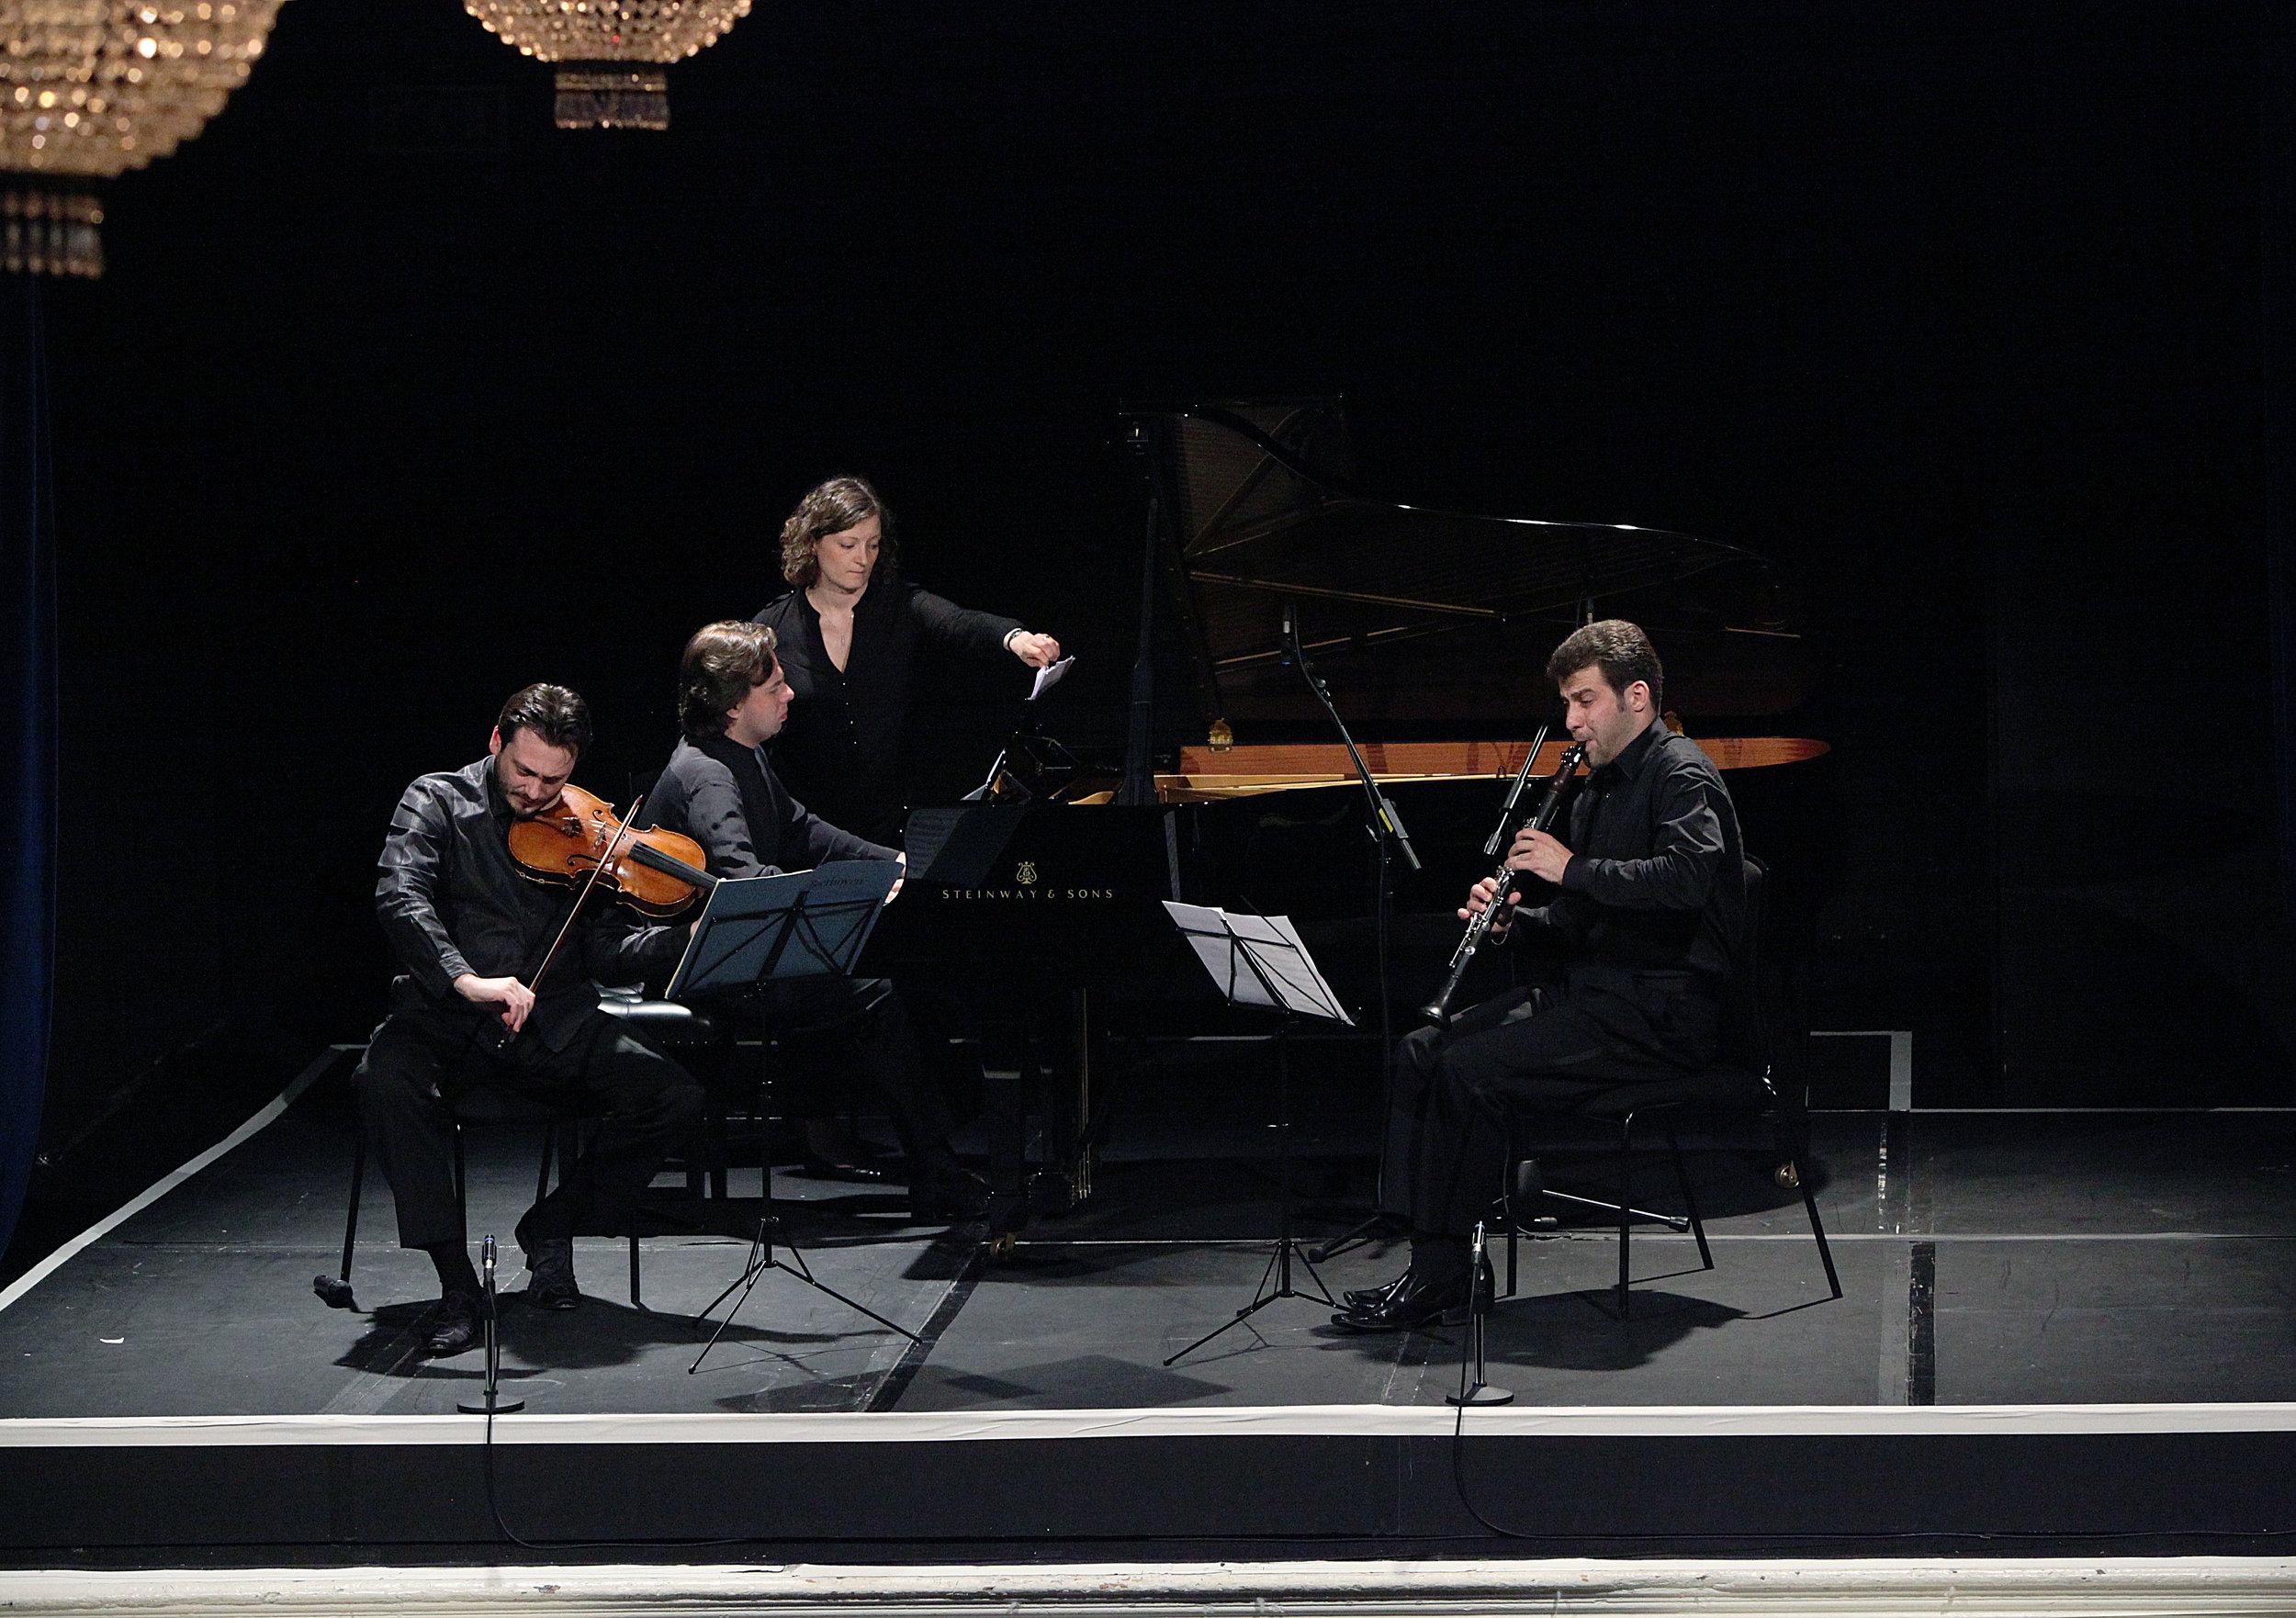 CLASSICAL VIENNA - MAY 1, 2014. 20th century theater, londonMaxim Rysanov, violaKristina Blaumane, celloAlexander Bedenko,clarinetJacob Katsnelson,pianoIllustrated talk by Stephen JohnsonHaydn -Piano Sonata No. 33 in C minor, Hob. XVI:20Mozart - Clarinet Trio in E flat major, K498 'Kegelstatt Trio' (for clarinet, viola and piano)Beethoven - Duet for viola and cello in E flat major, WoO 32 'Eyeglass'Beethoven - Clarinet Trio in B flat major, Op. 11 (arr. for viola, cello and piano)